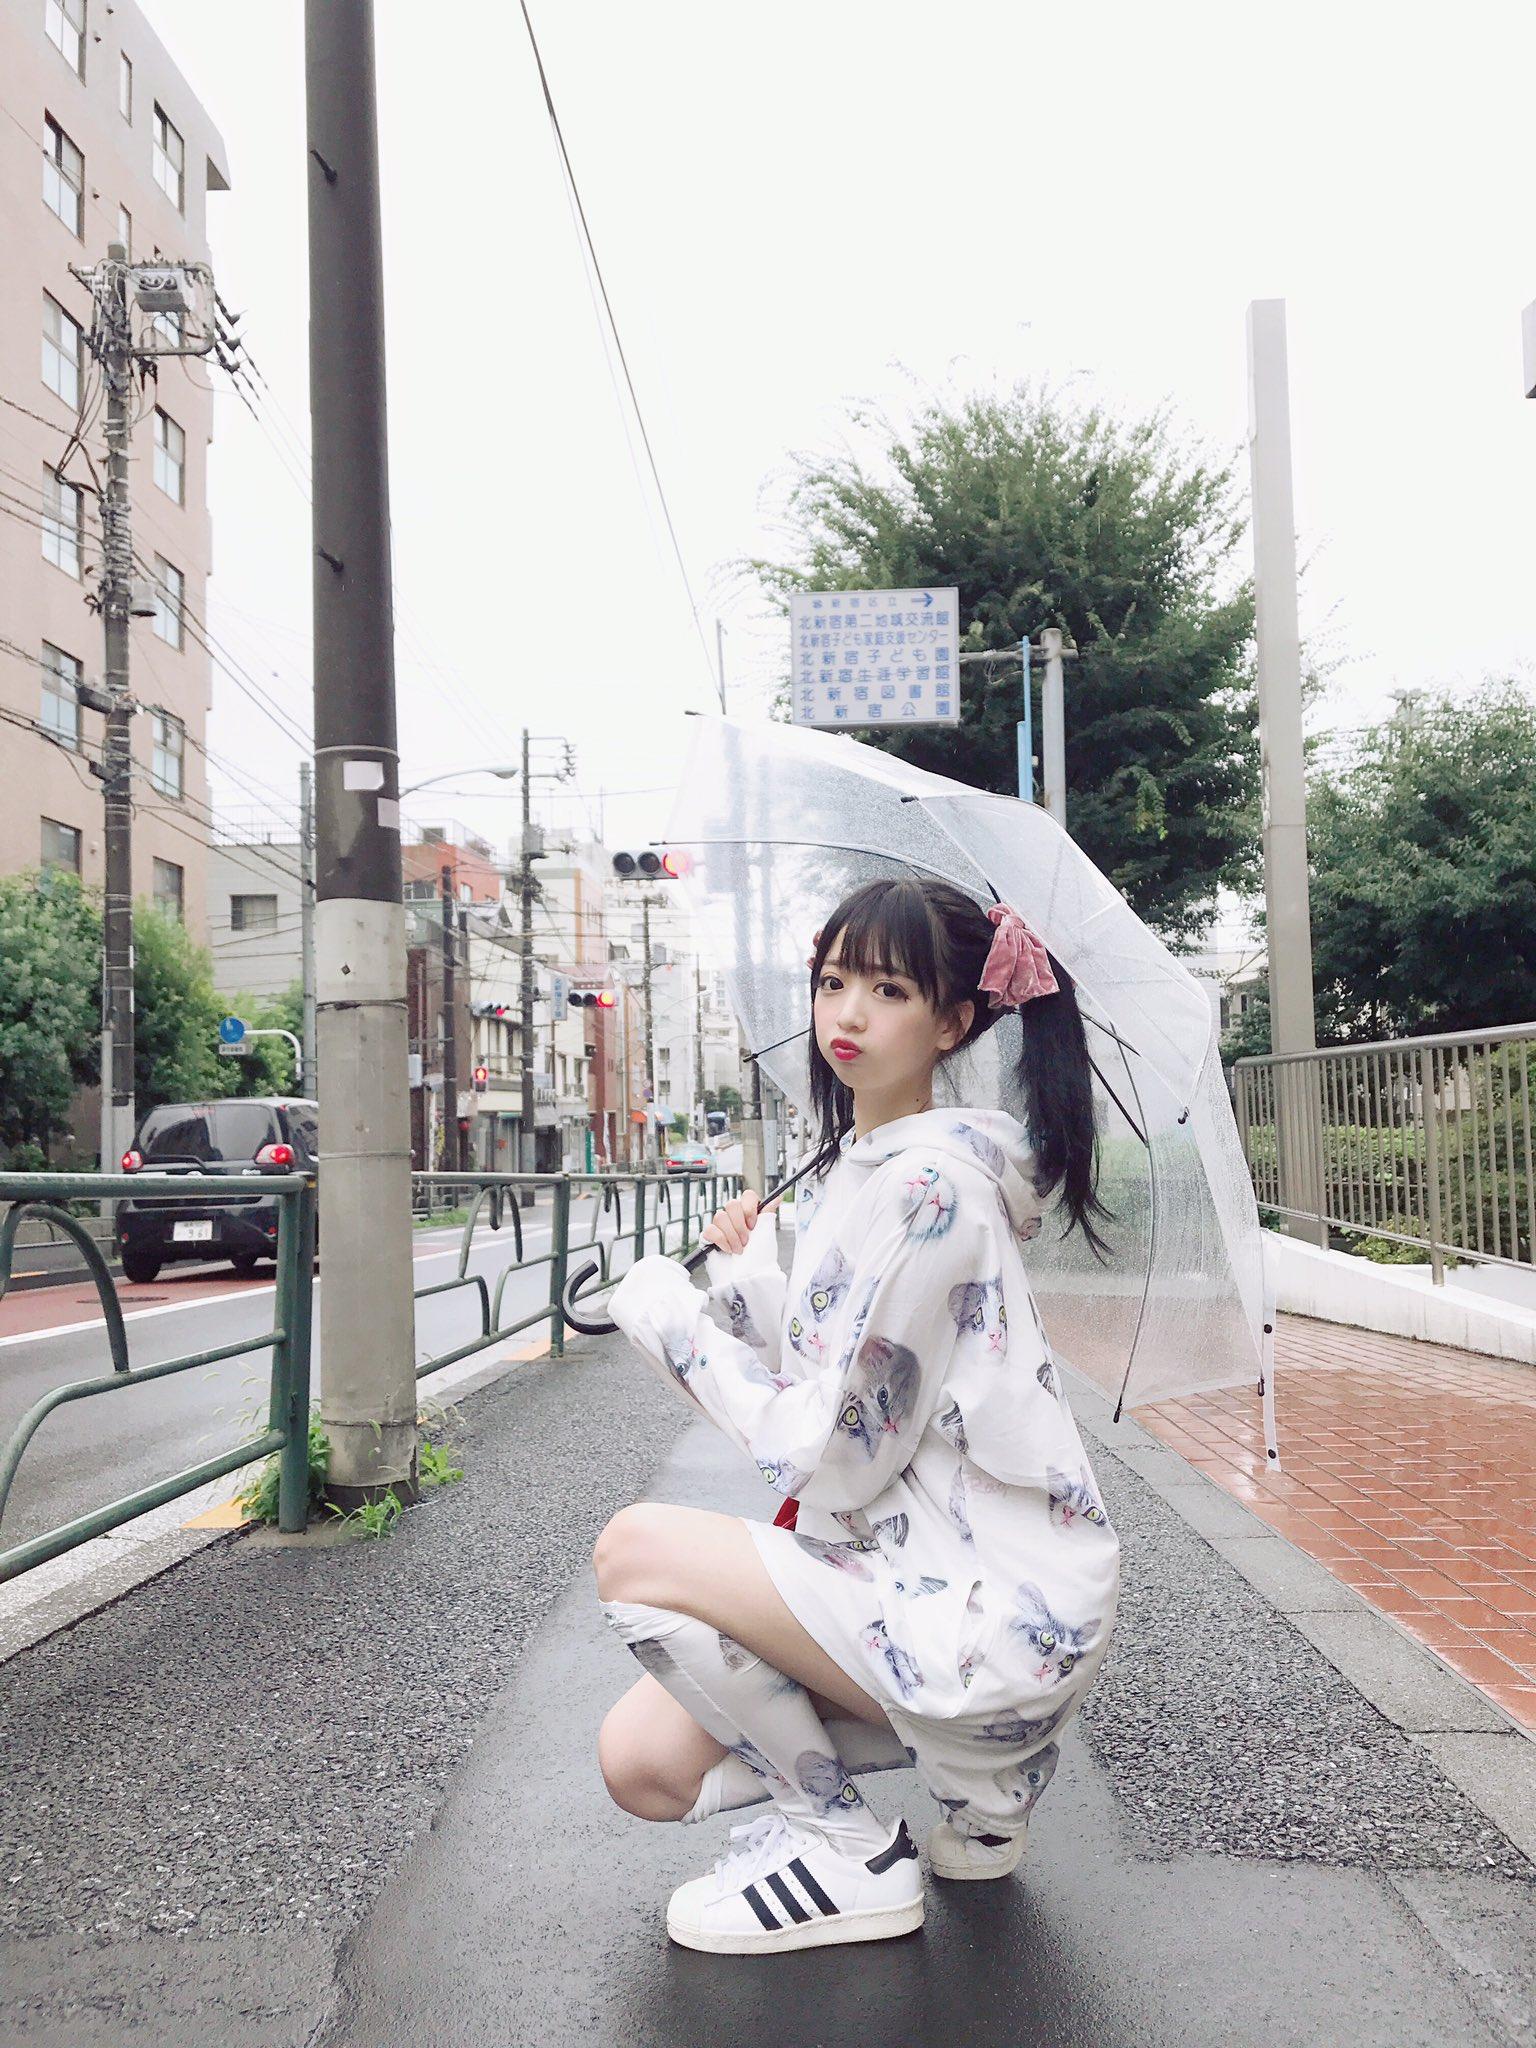 童颜巨乳COSER小姐姐yami推特图集 Yami-twitter9(10)